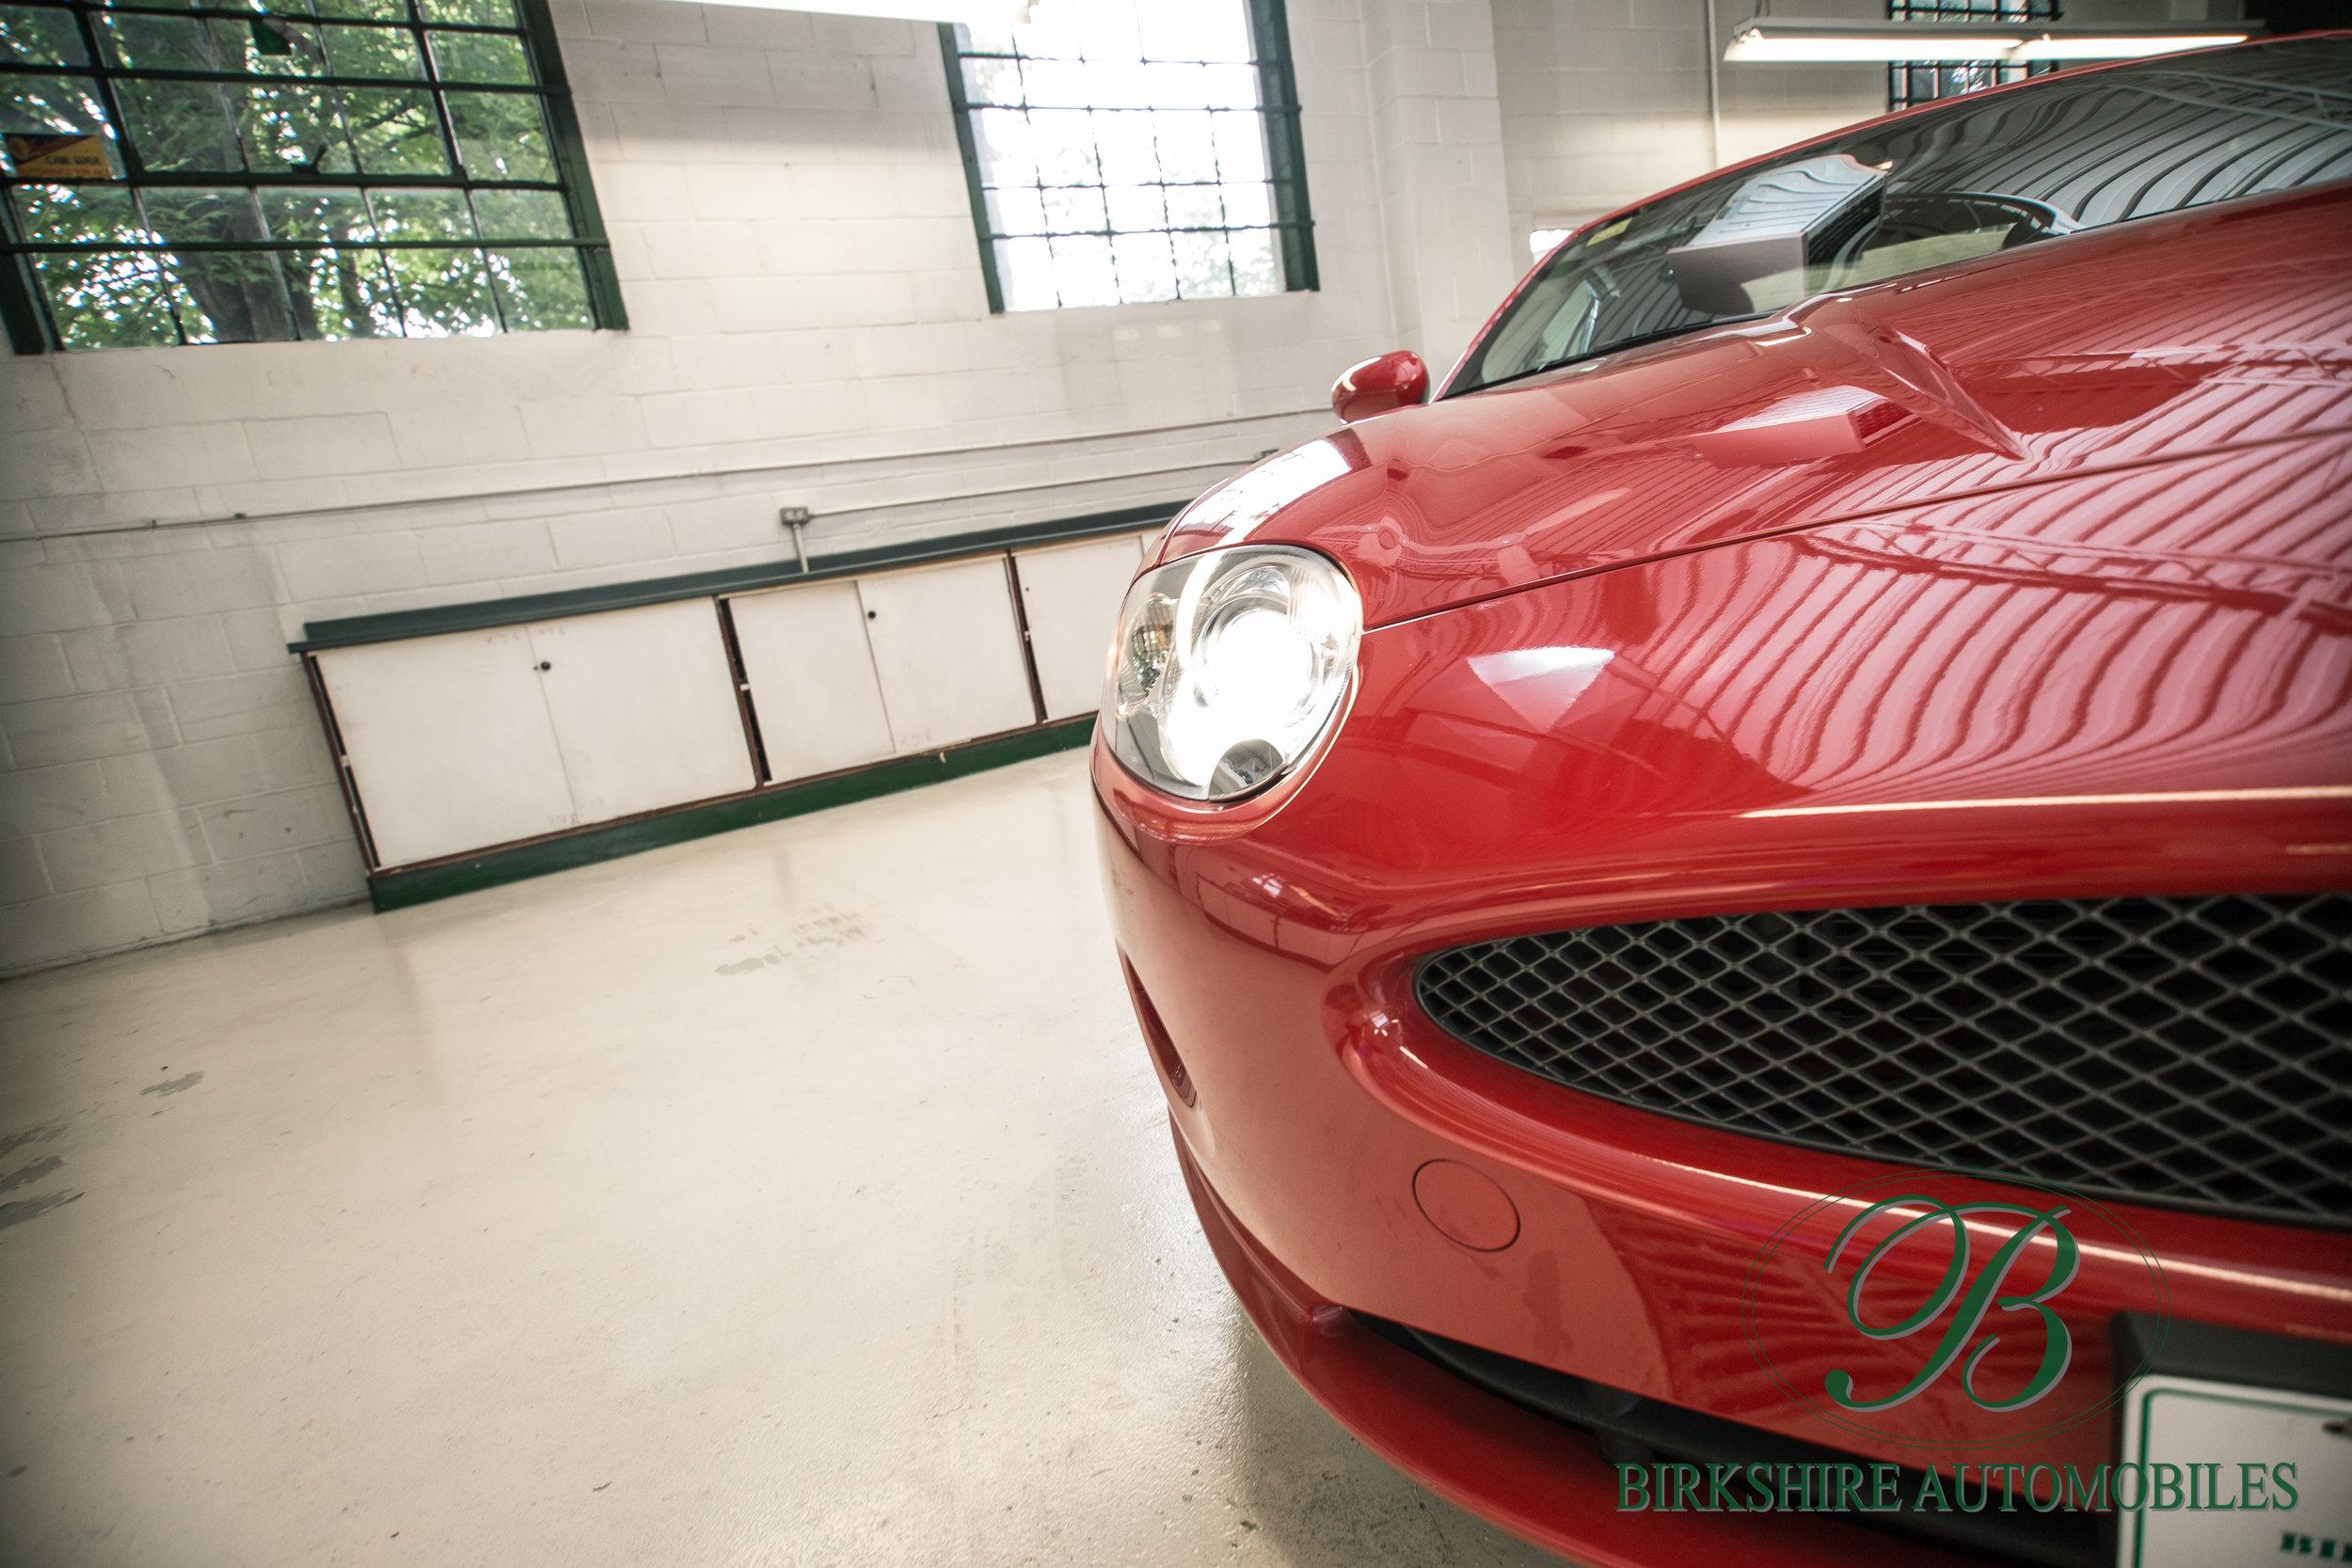 Birkshire Automobiles-76.jpg